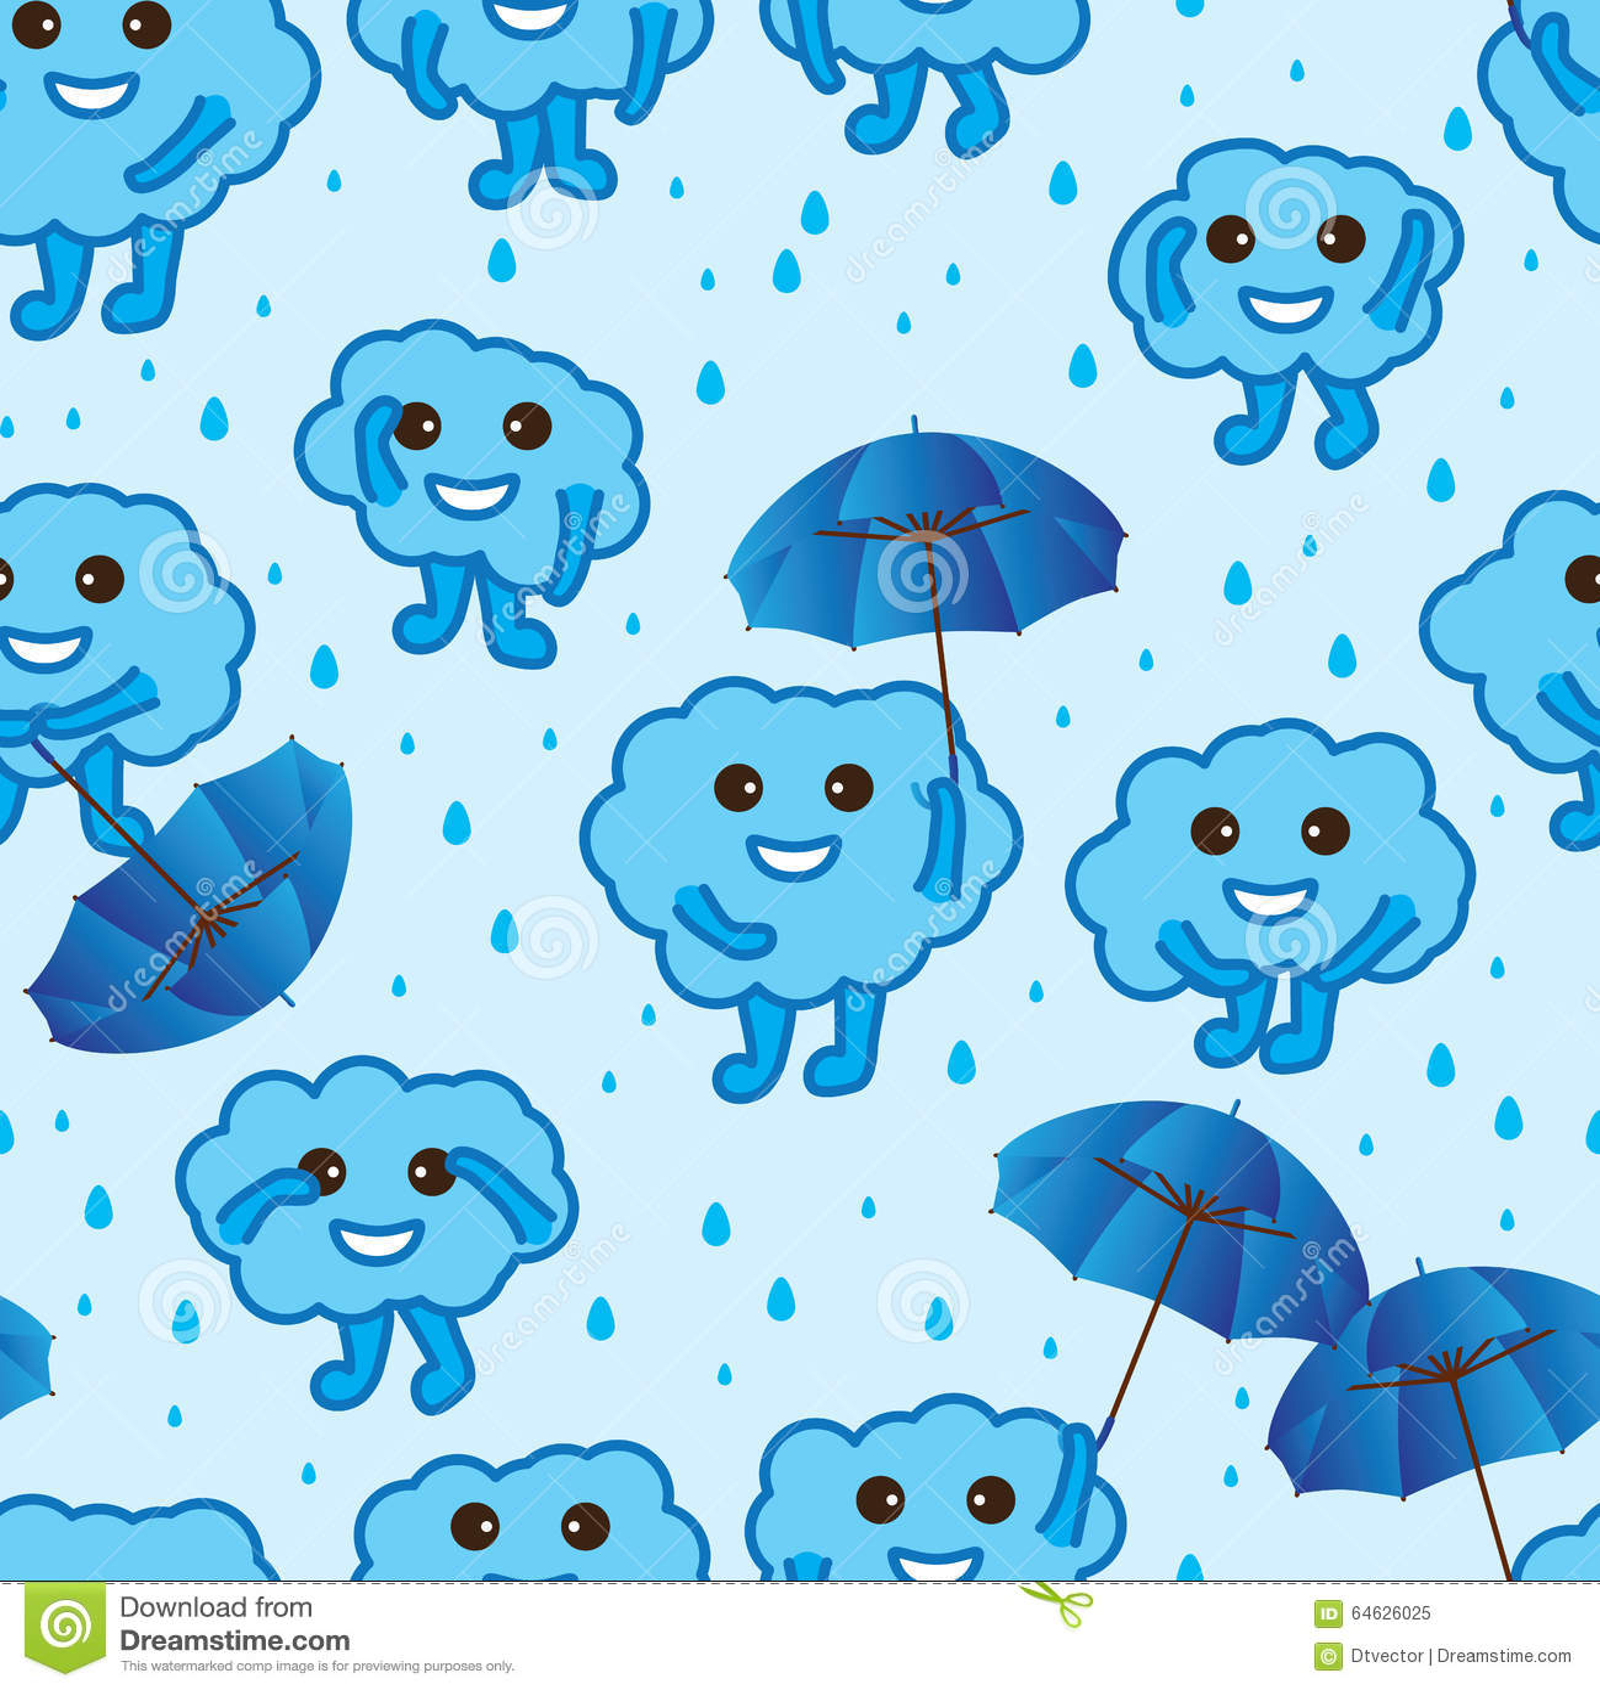 Cloud Happy Cute Blue Seamless Pattern